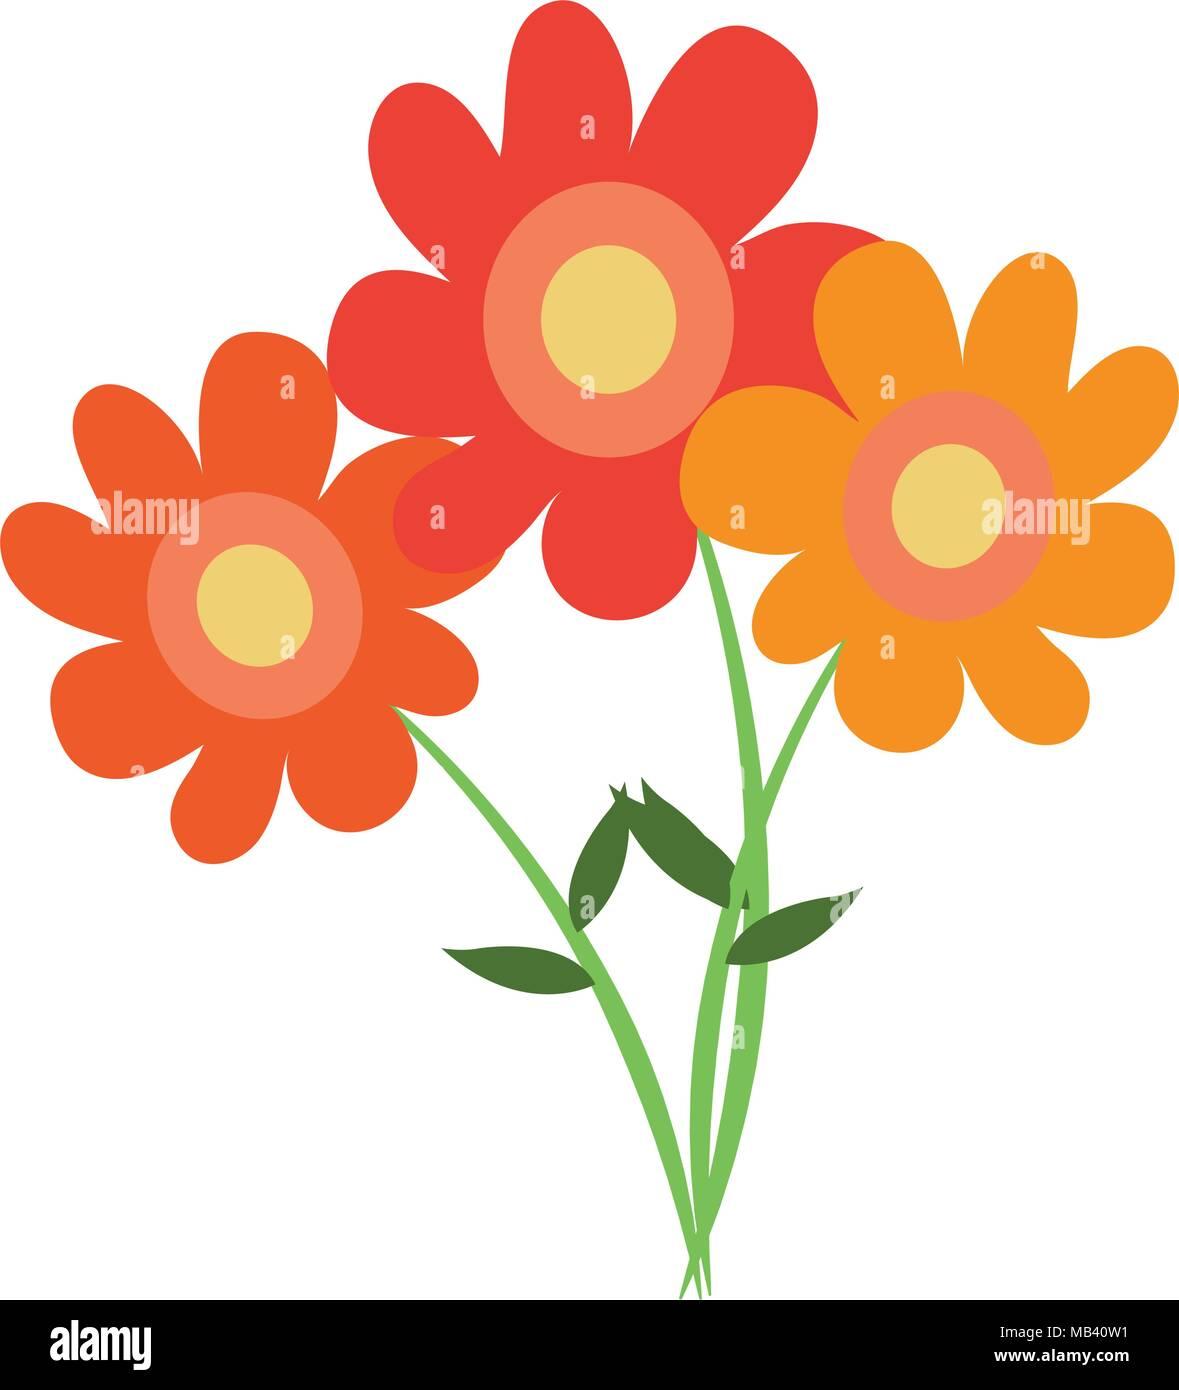 Beautiful Flowers Cartoon Stock Vector Art Illustration Vector